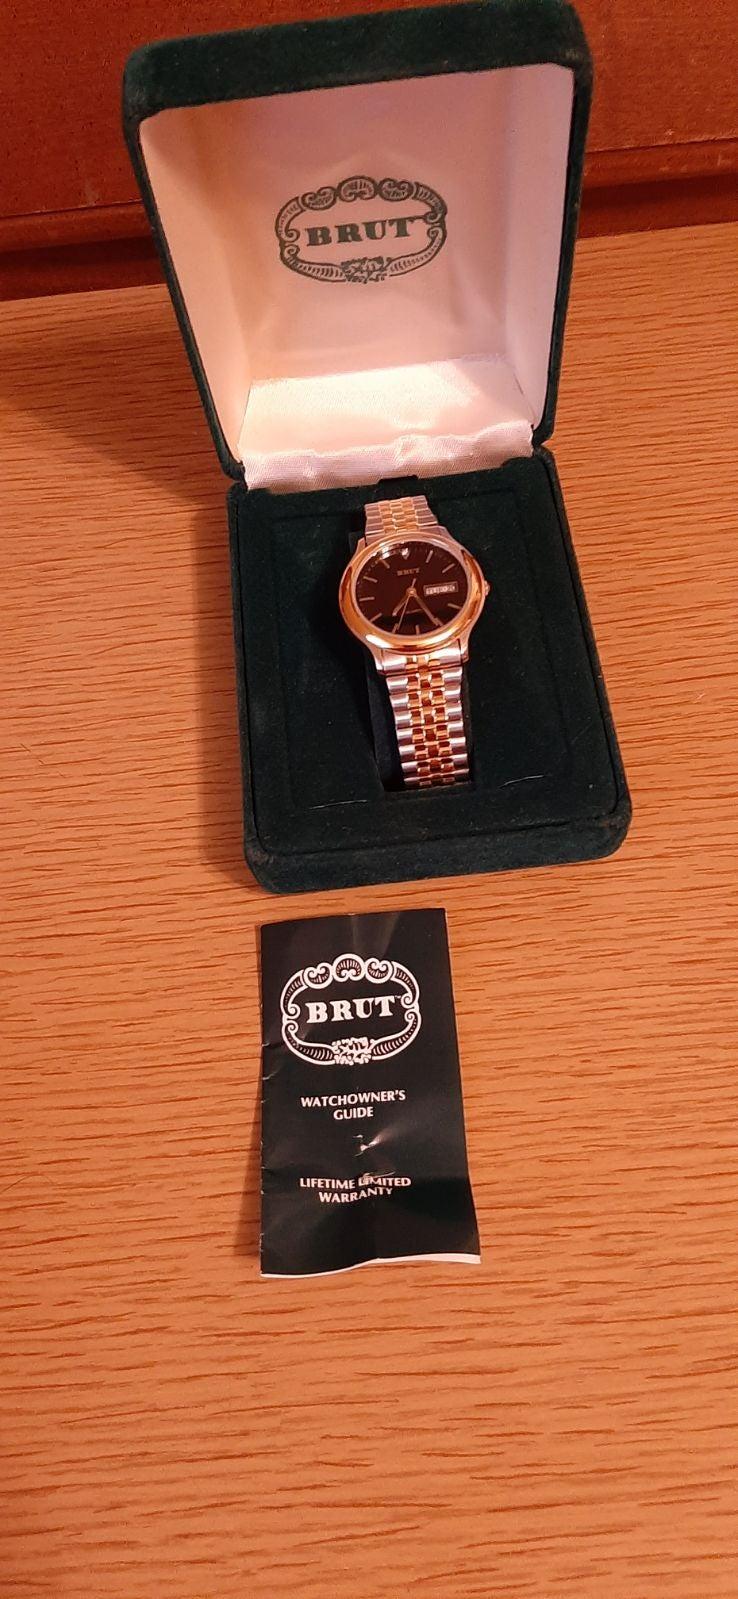 Brut wrist watch